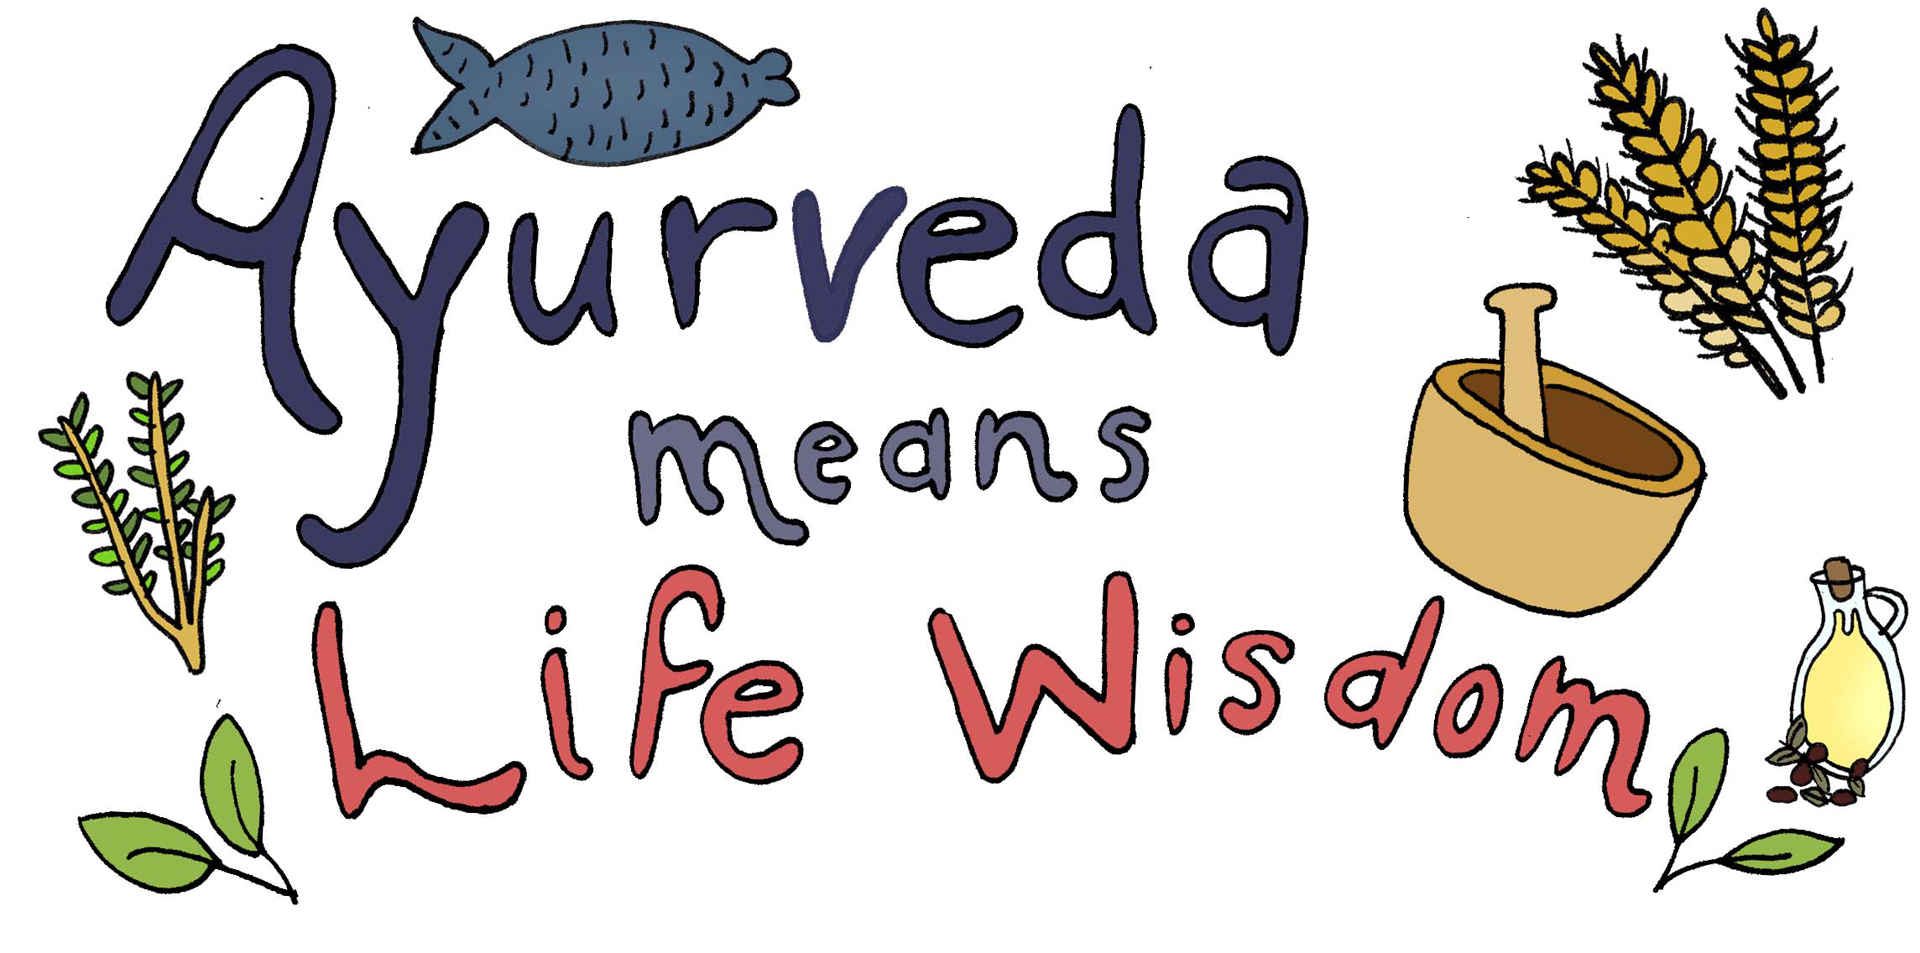 Ayurveda means Life Wisdom